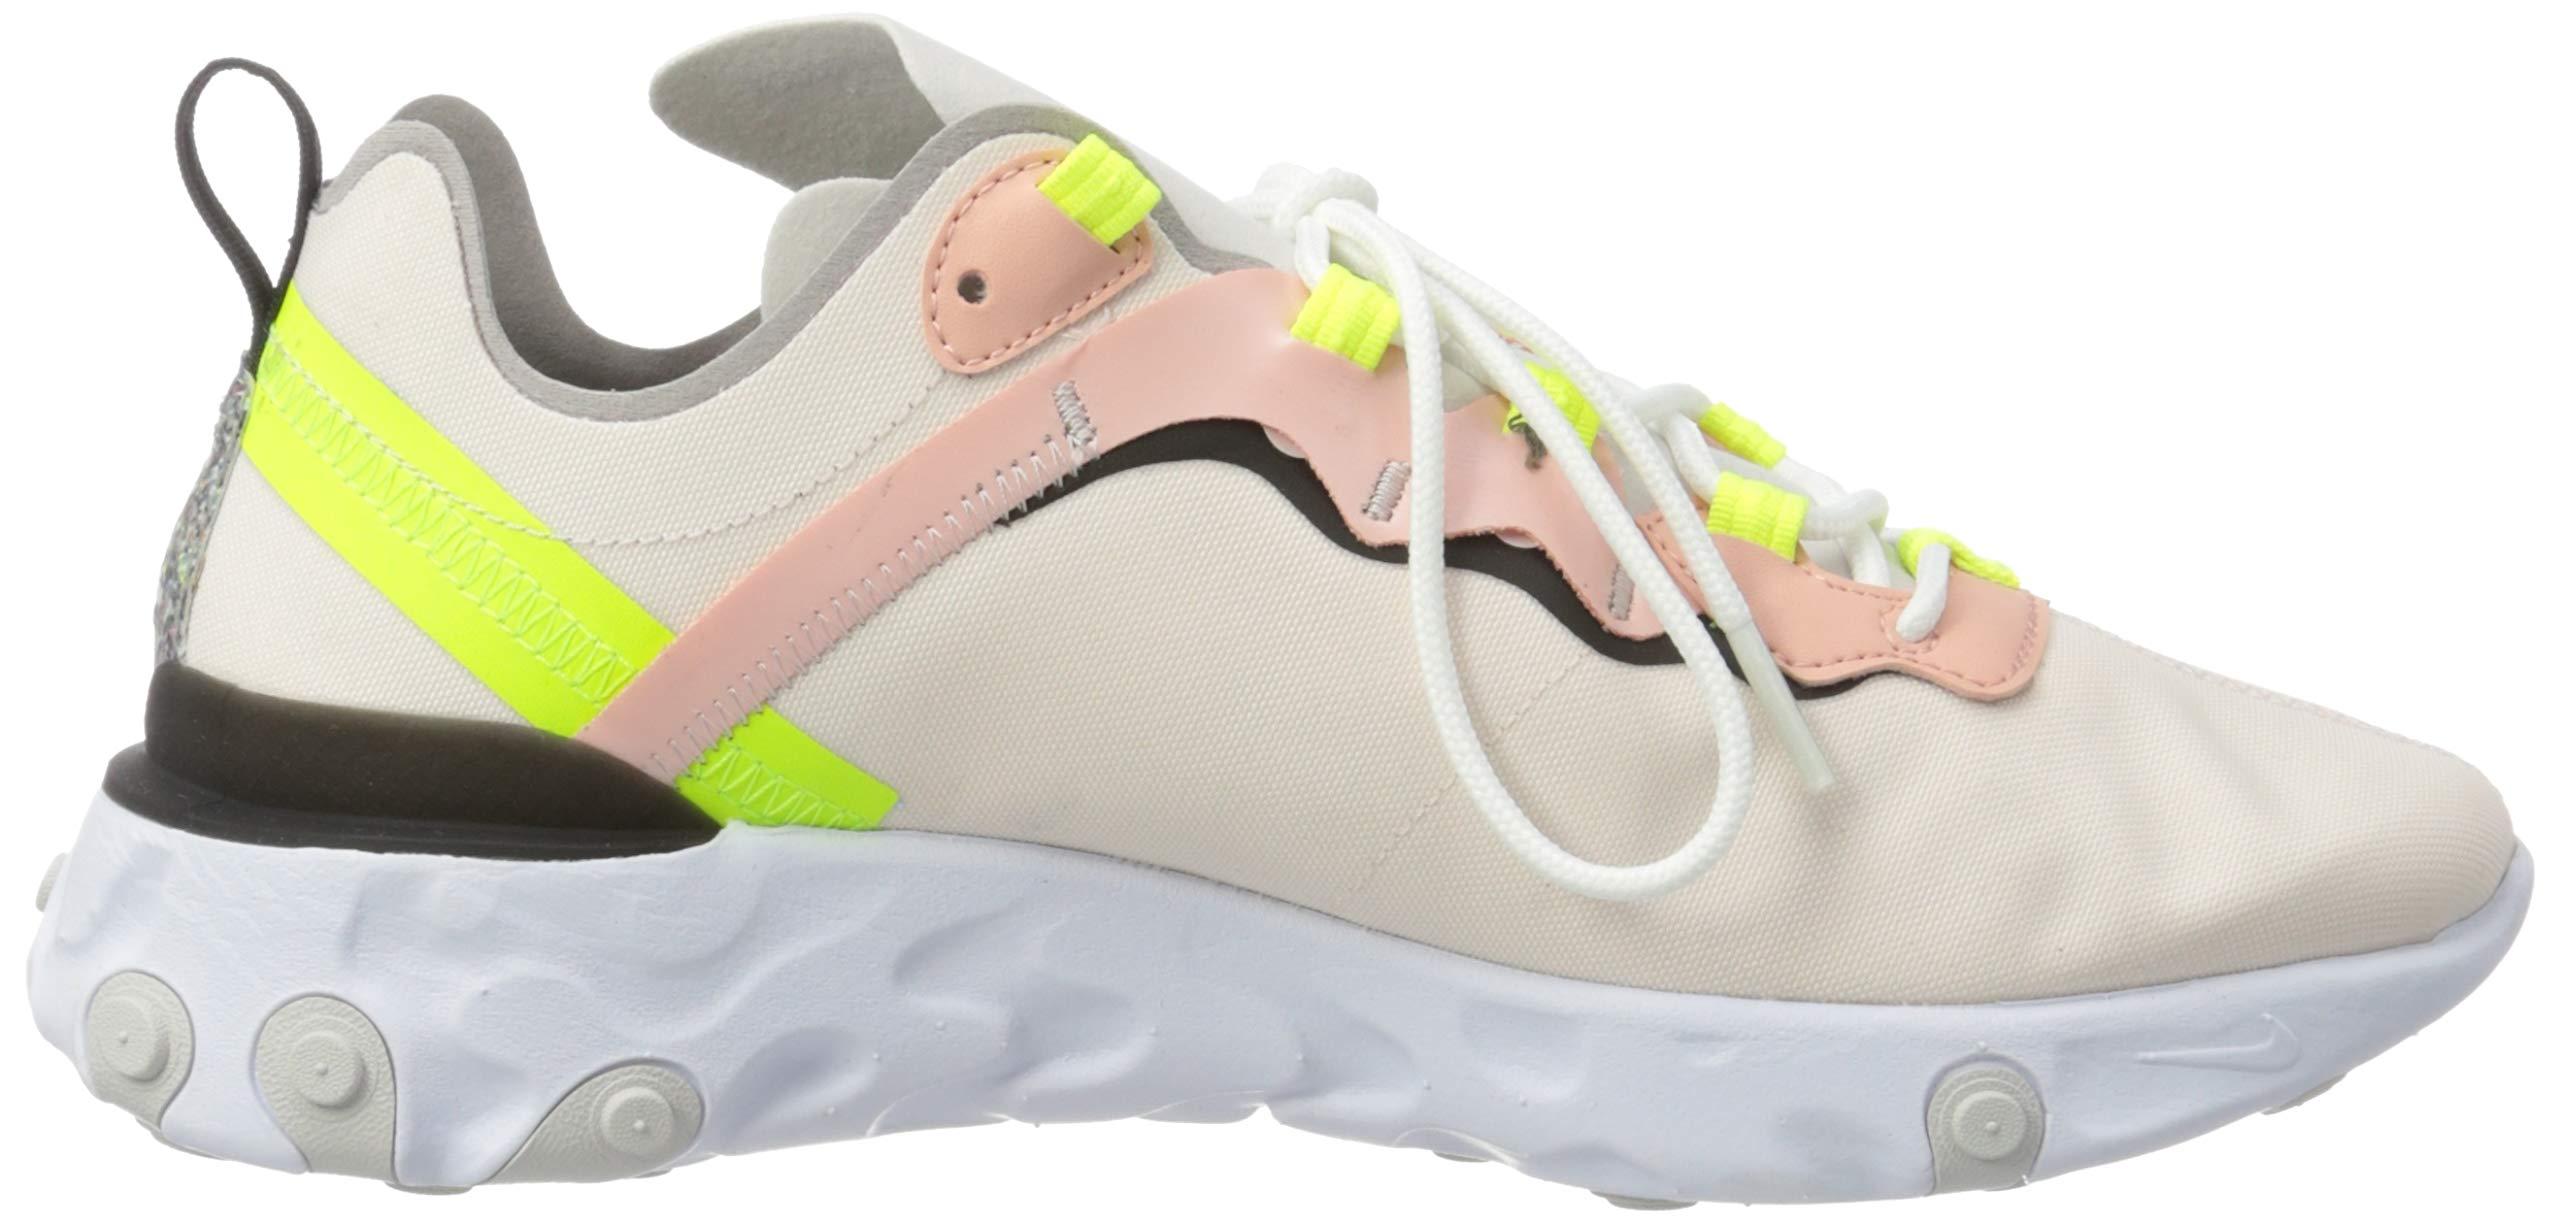 71pl6nmhfyL - Nike Women's W React Element 55 PRM Track & Field Shoes